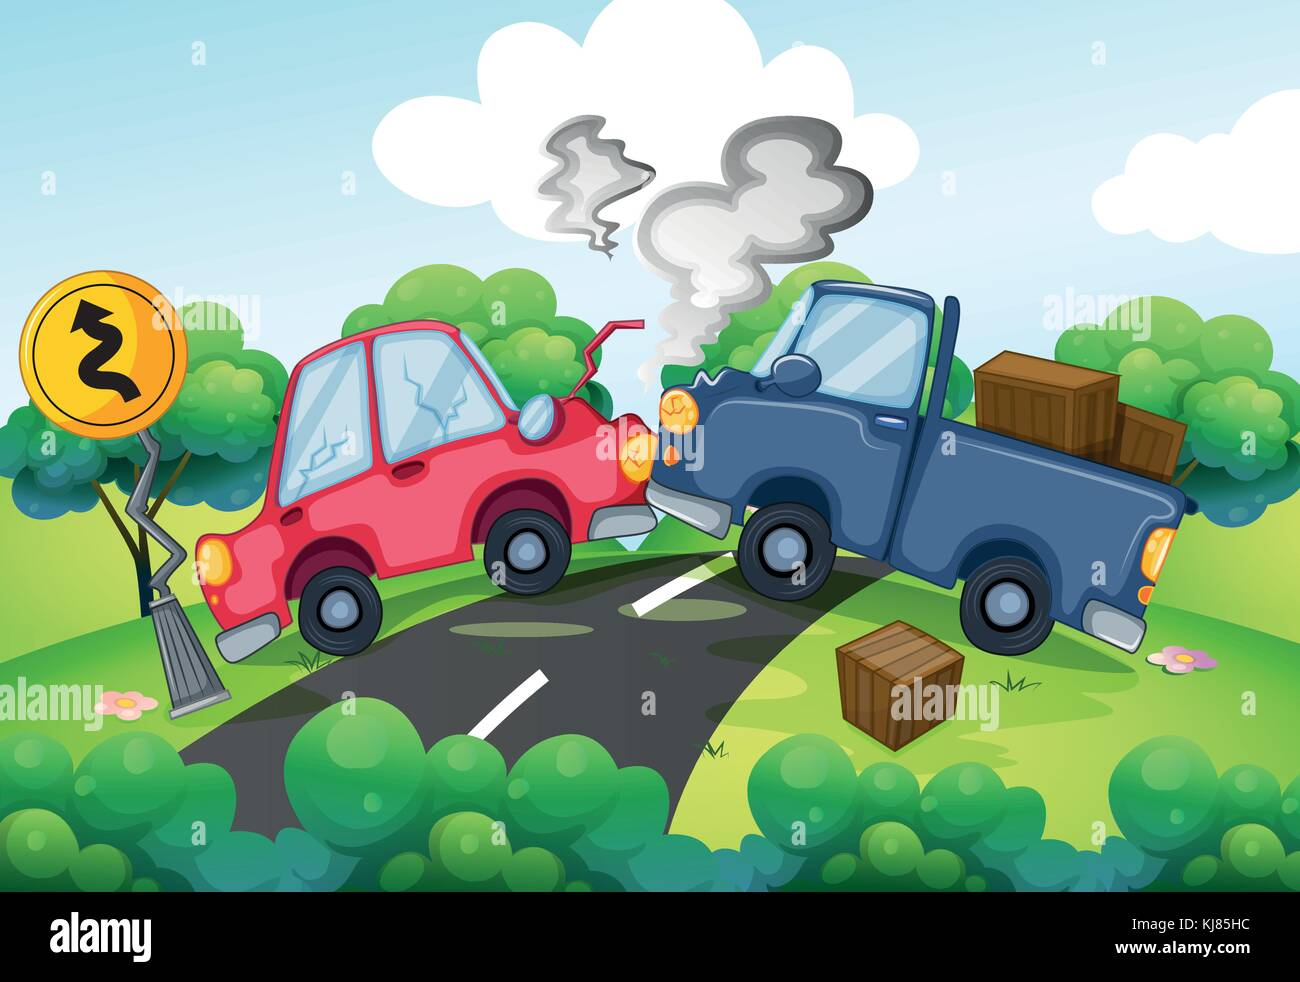 Accident Vectors Stockfotos & Accident Vectors Bilder - Seite 2 - Alamy